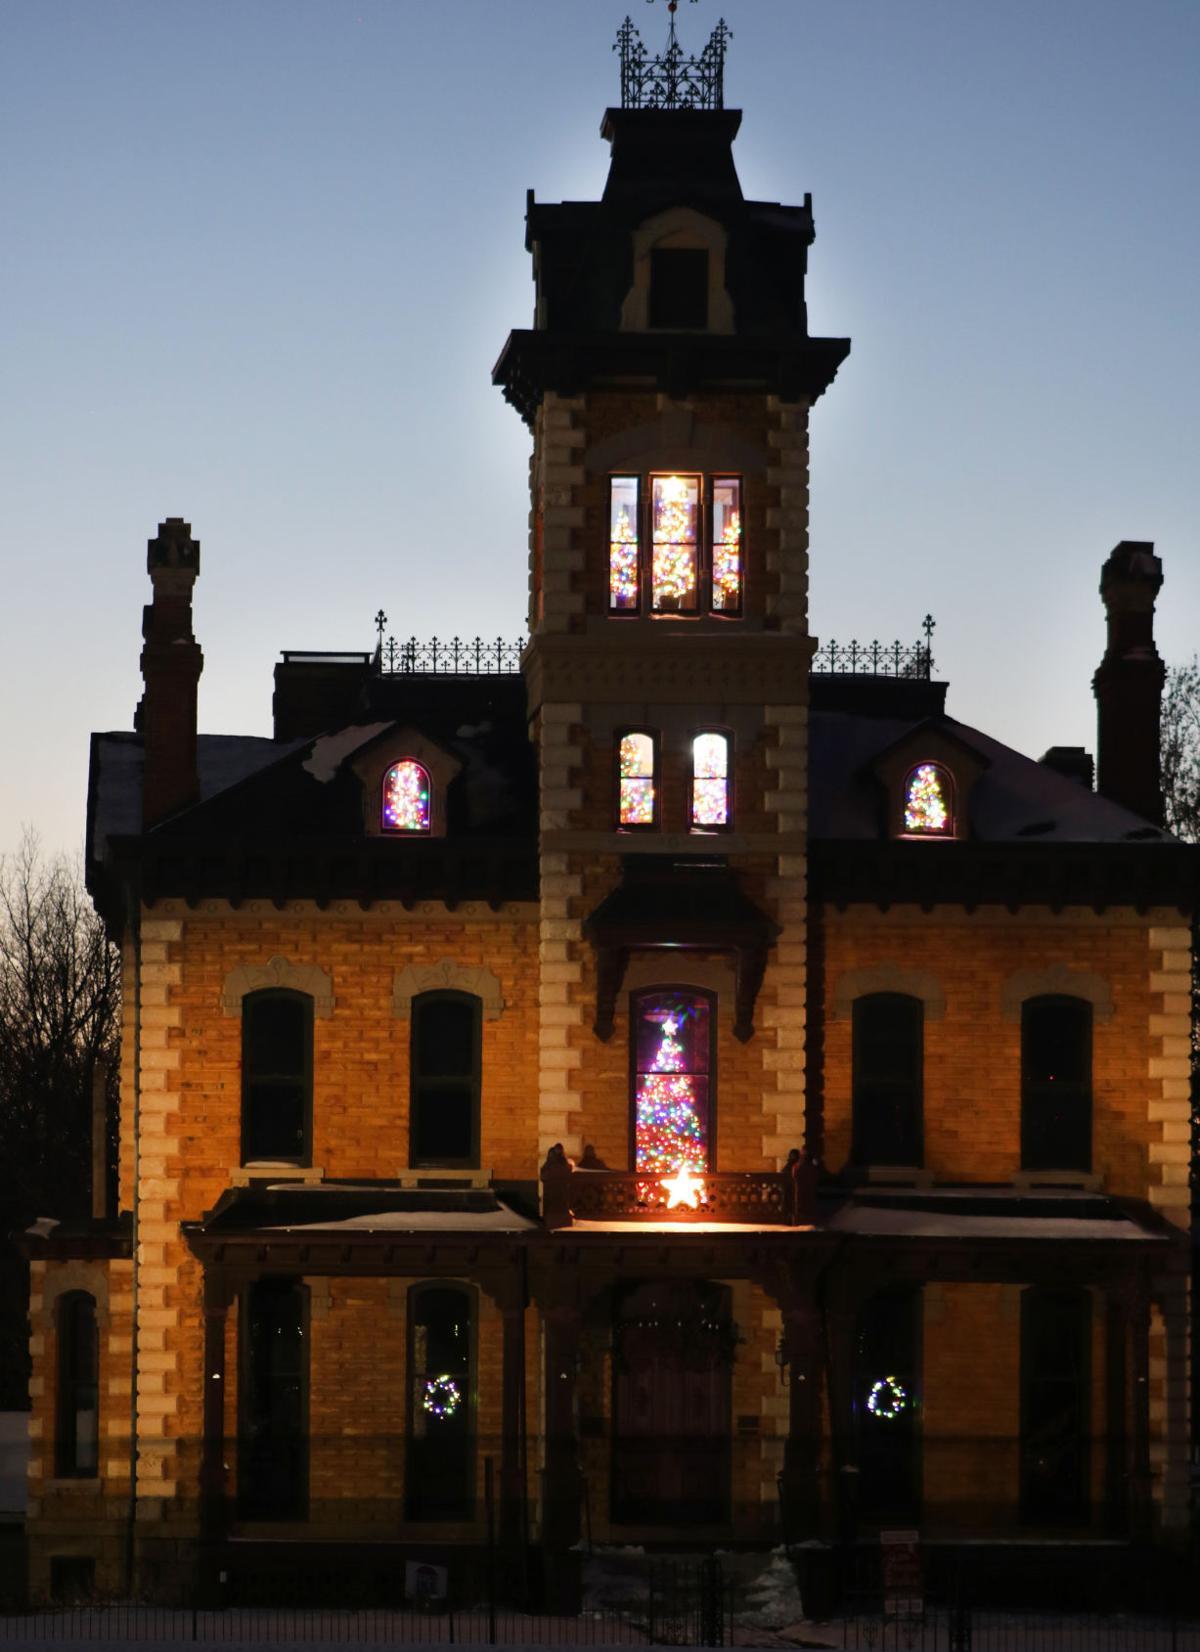 Lebond Mansion